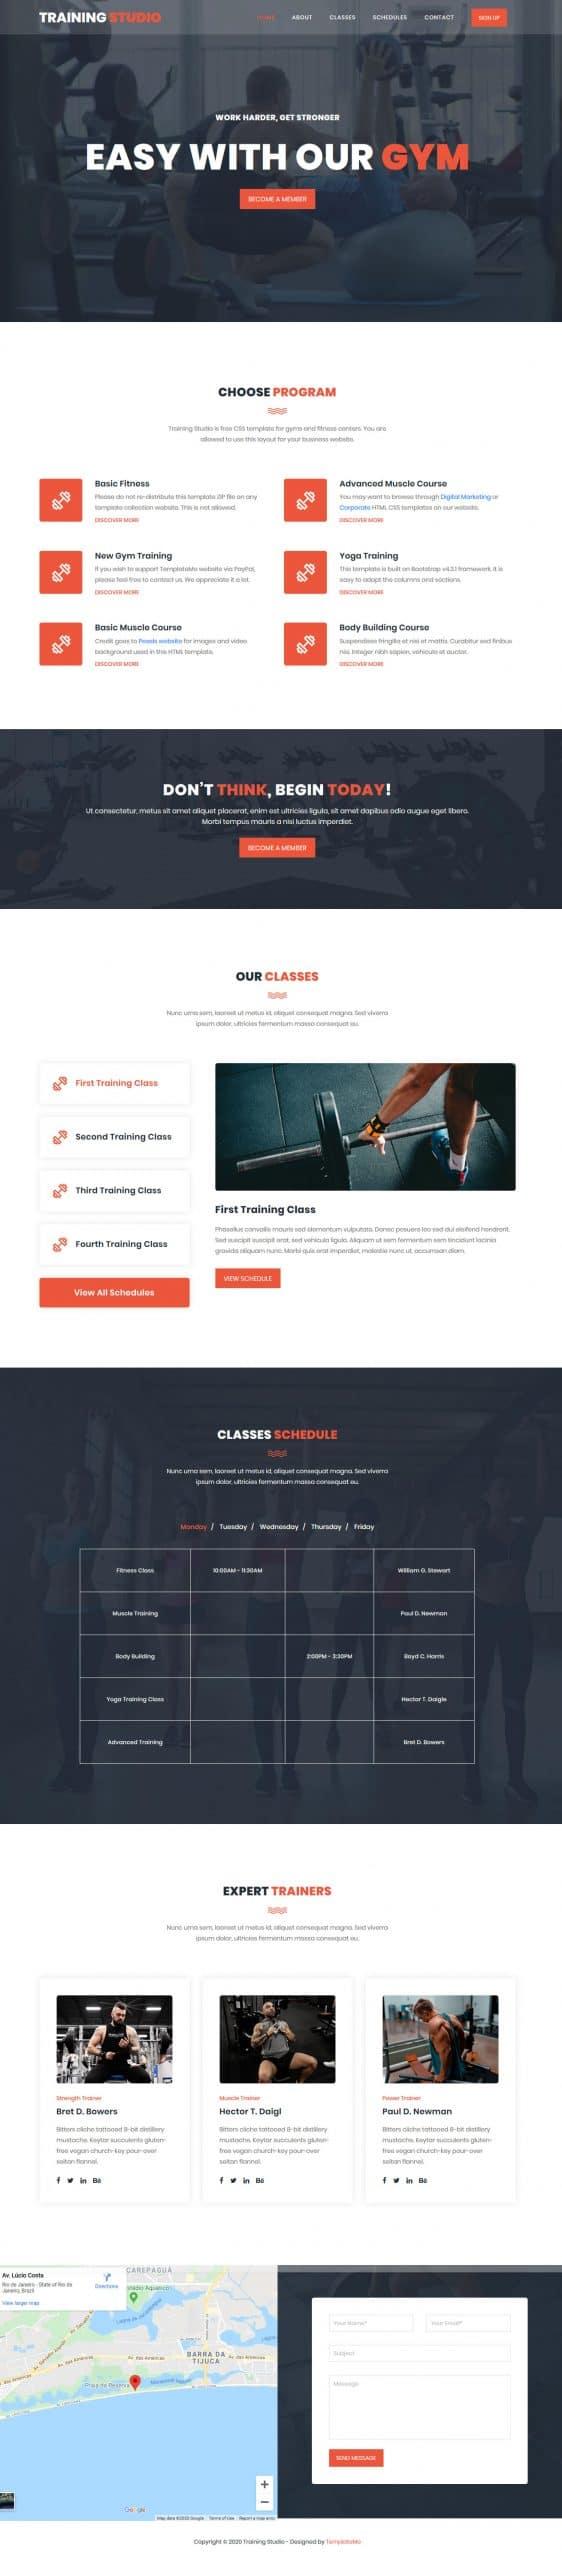 Training Studio- gym/fitness website HTML template